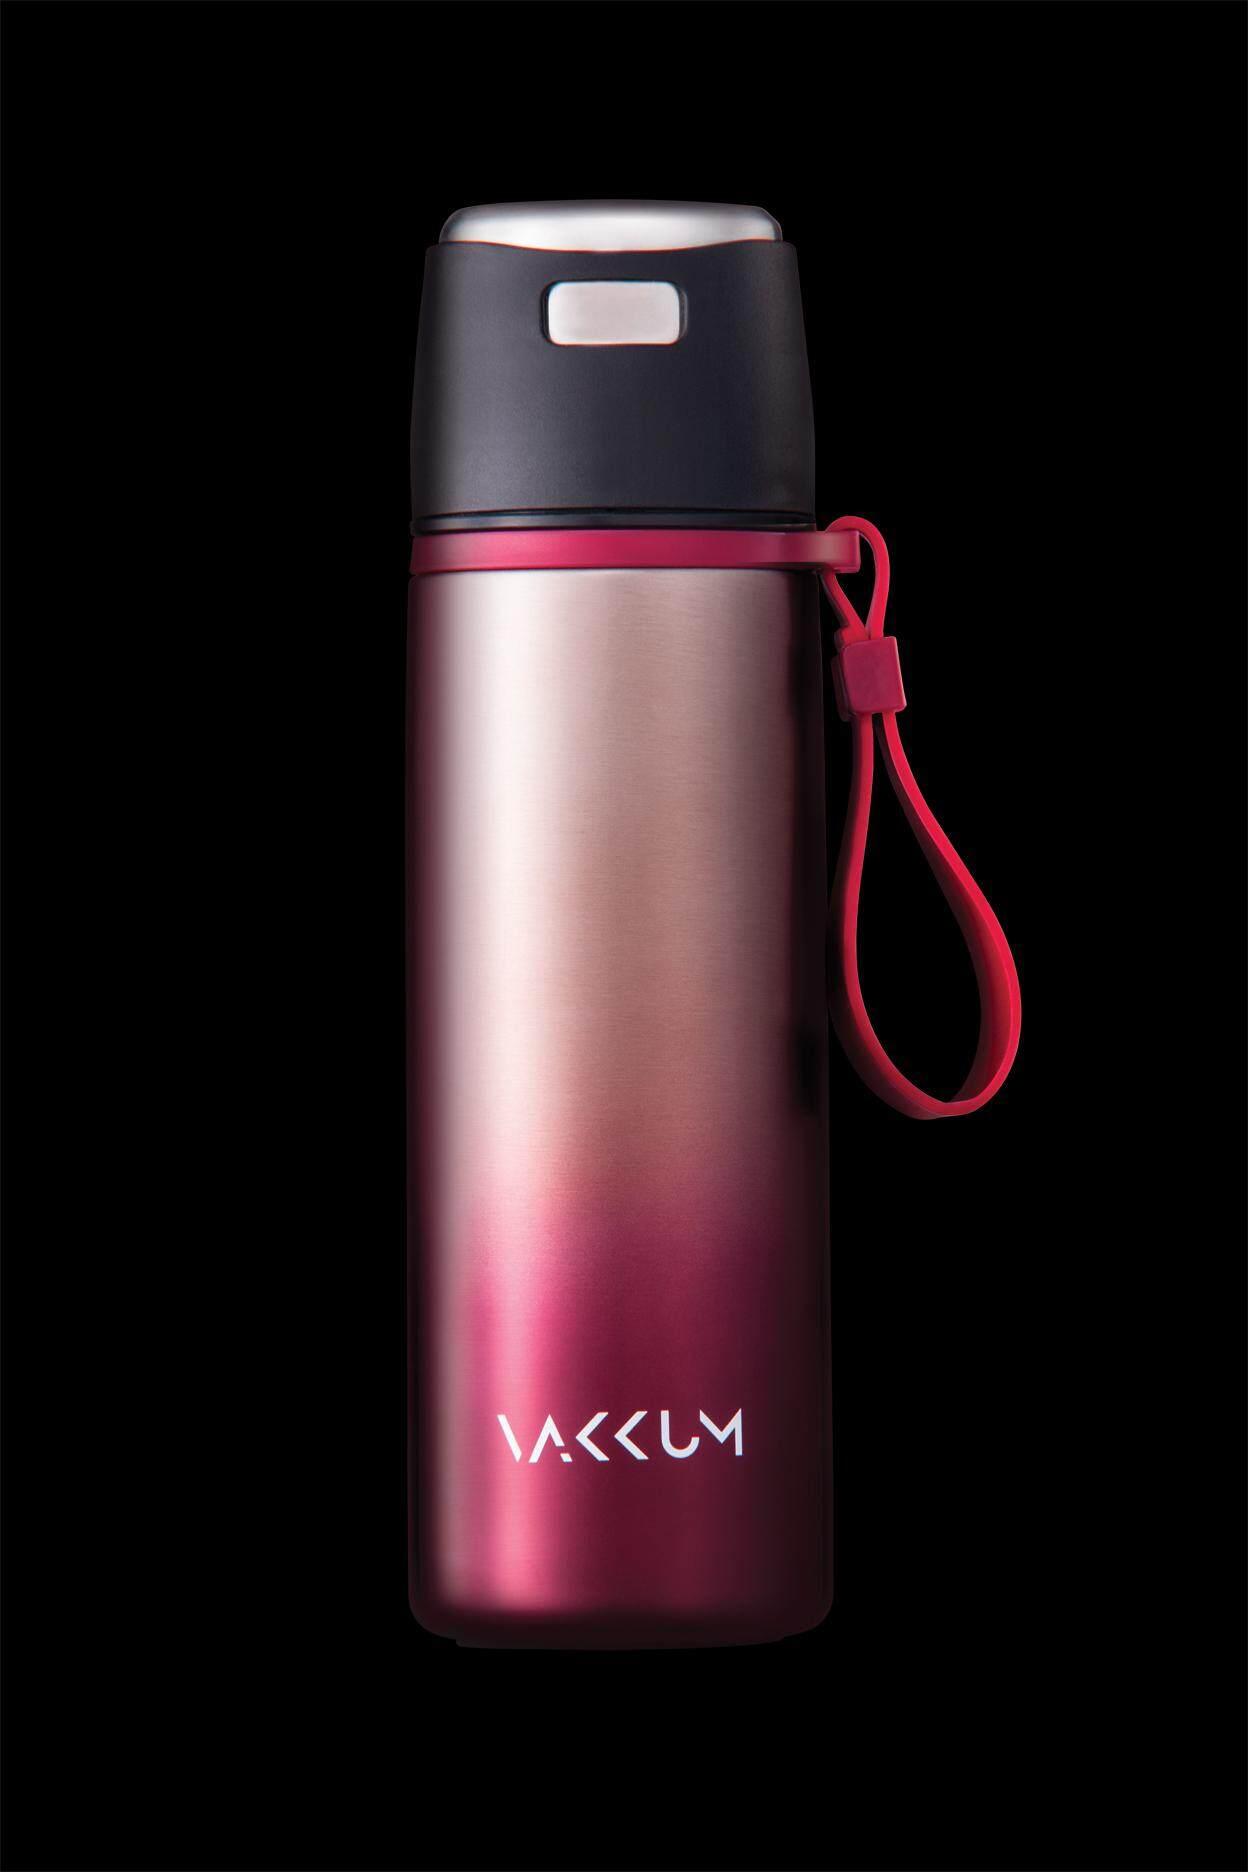 [LIVE]  ANTI-BACTERIAL VAKKUM FLASK ESSENTIAL 500ml DOUBLE WALL S.S. - VK-200350-LA